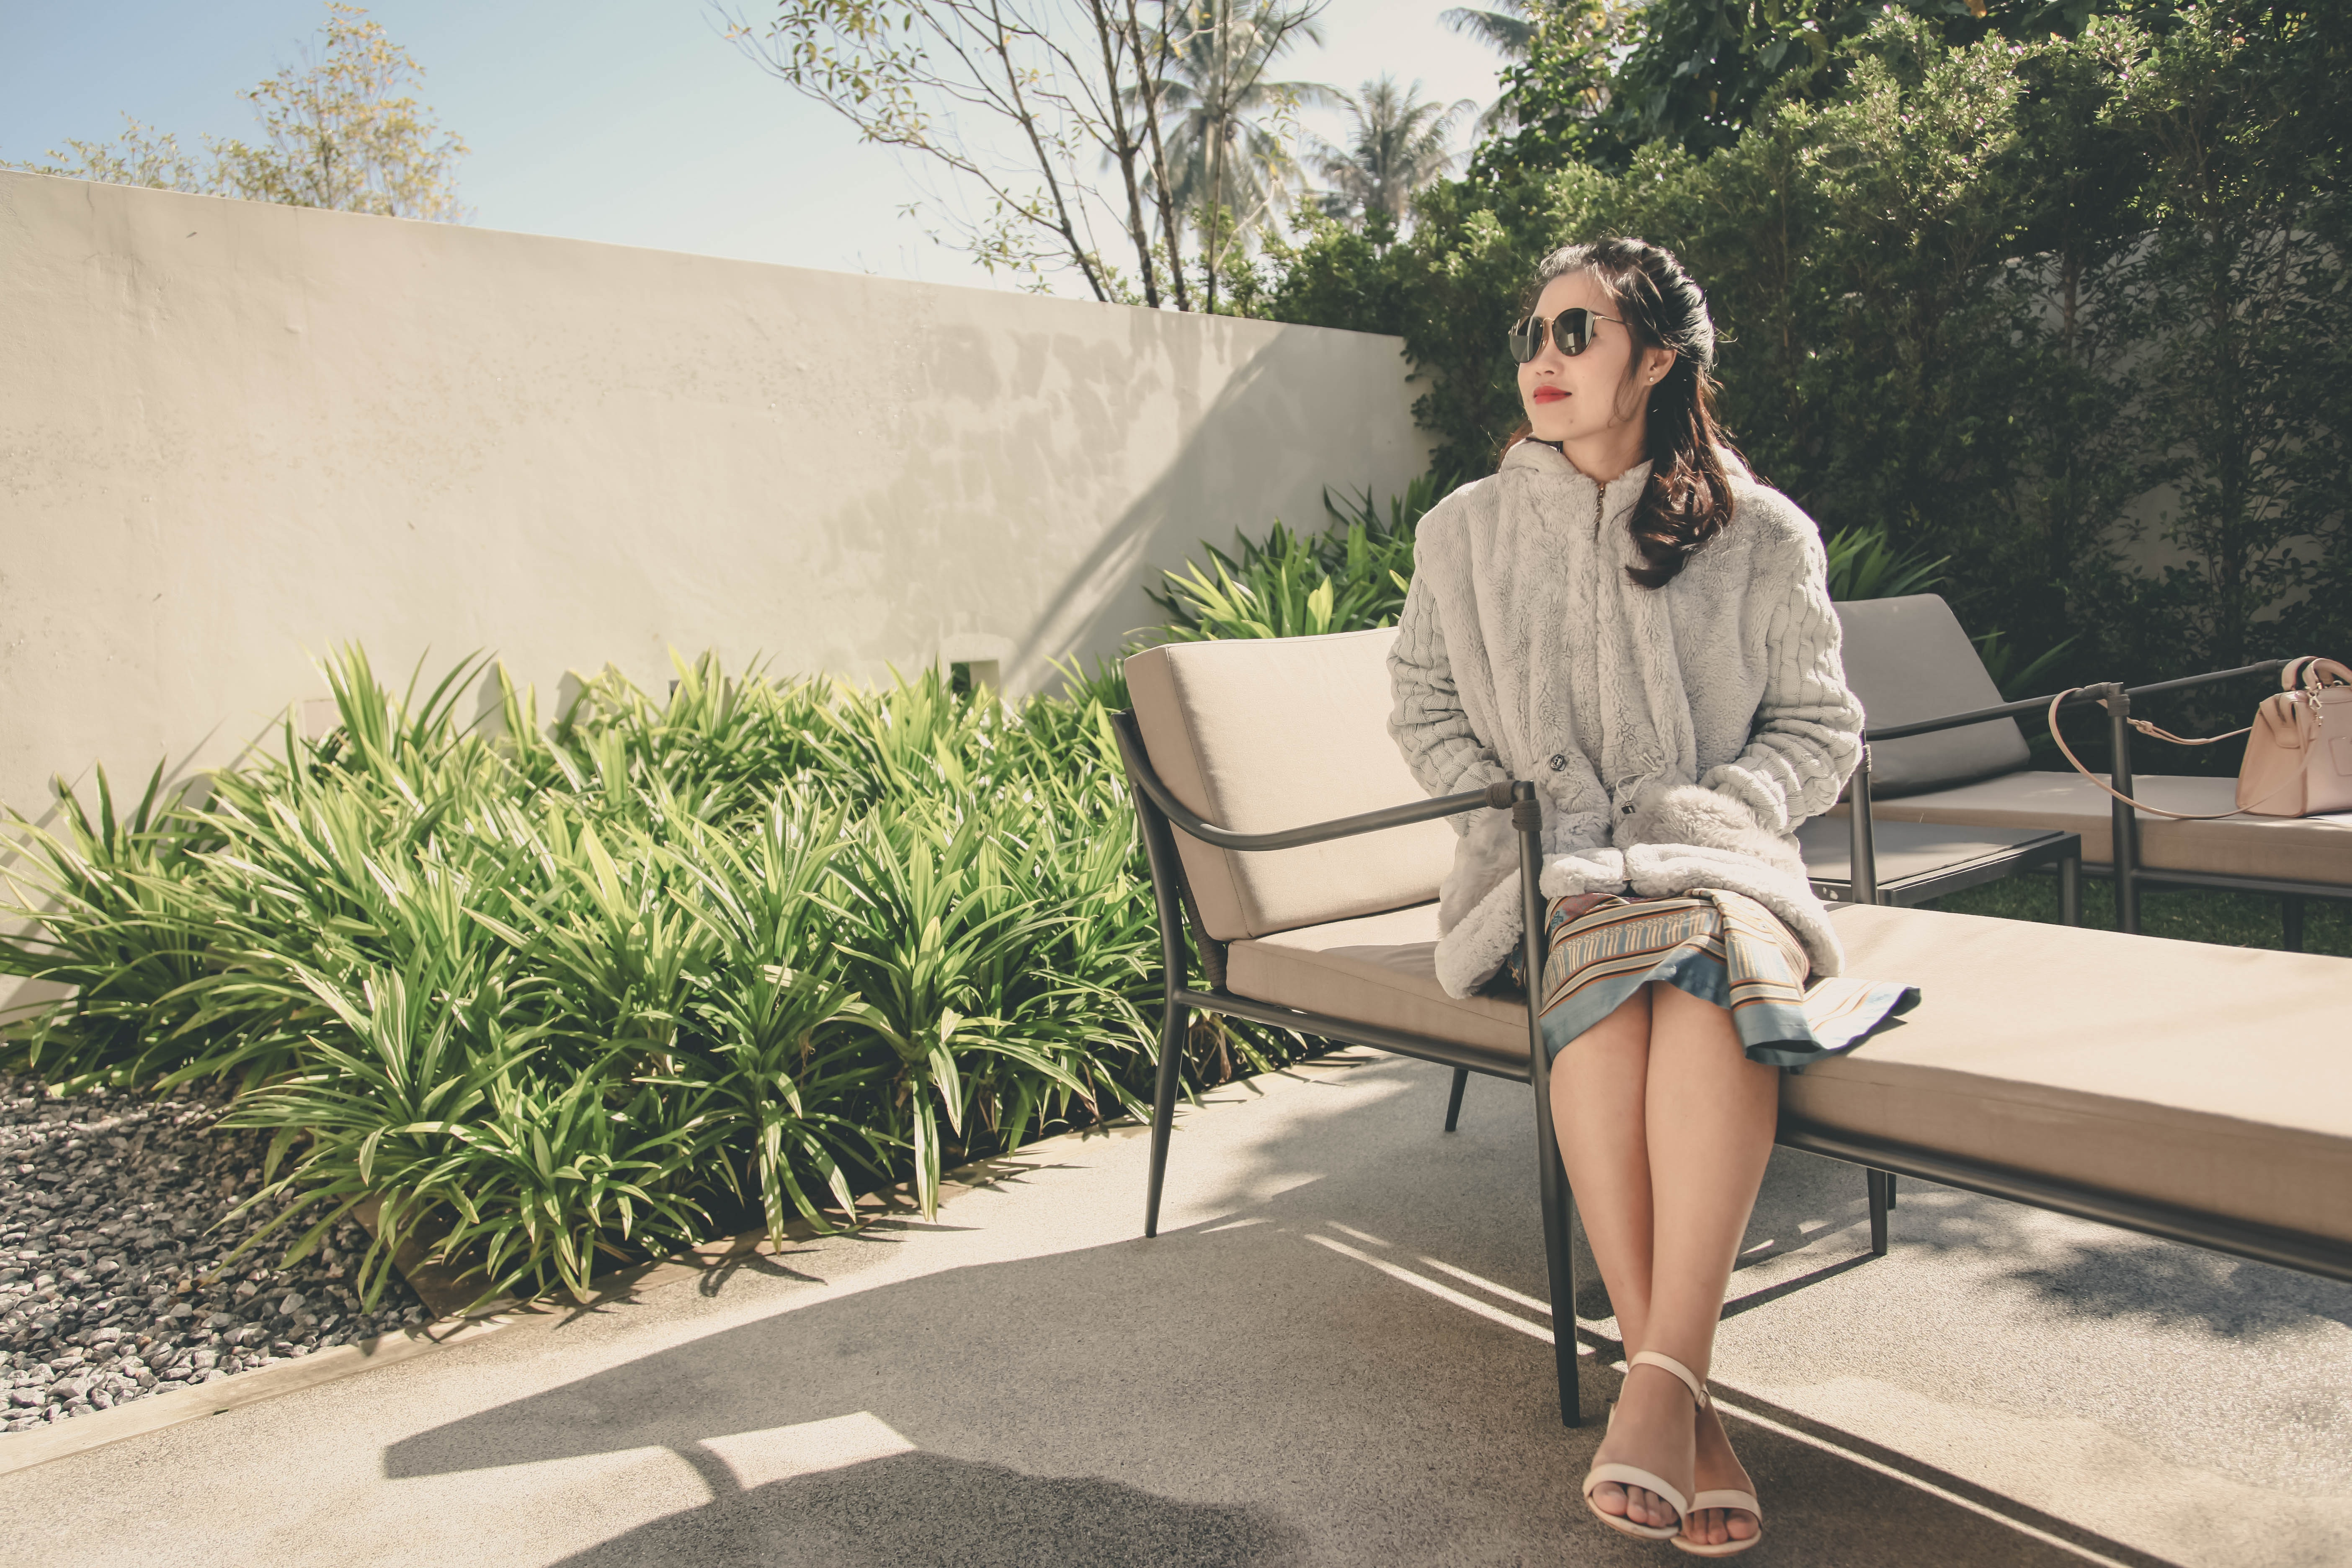 Woman wearing hoodie sitting on lounge chair photo